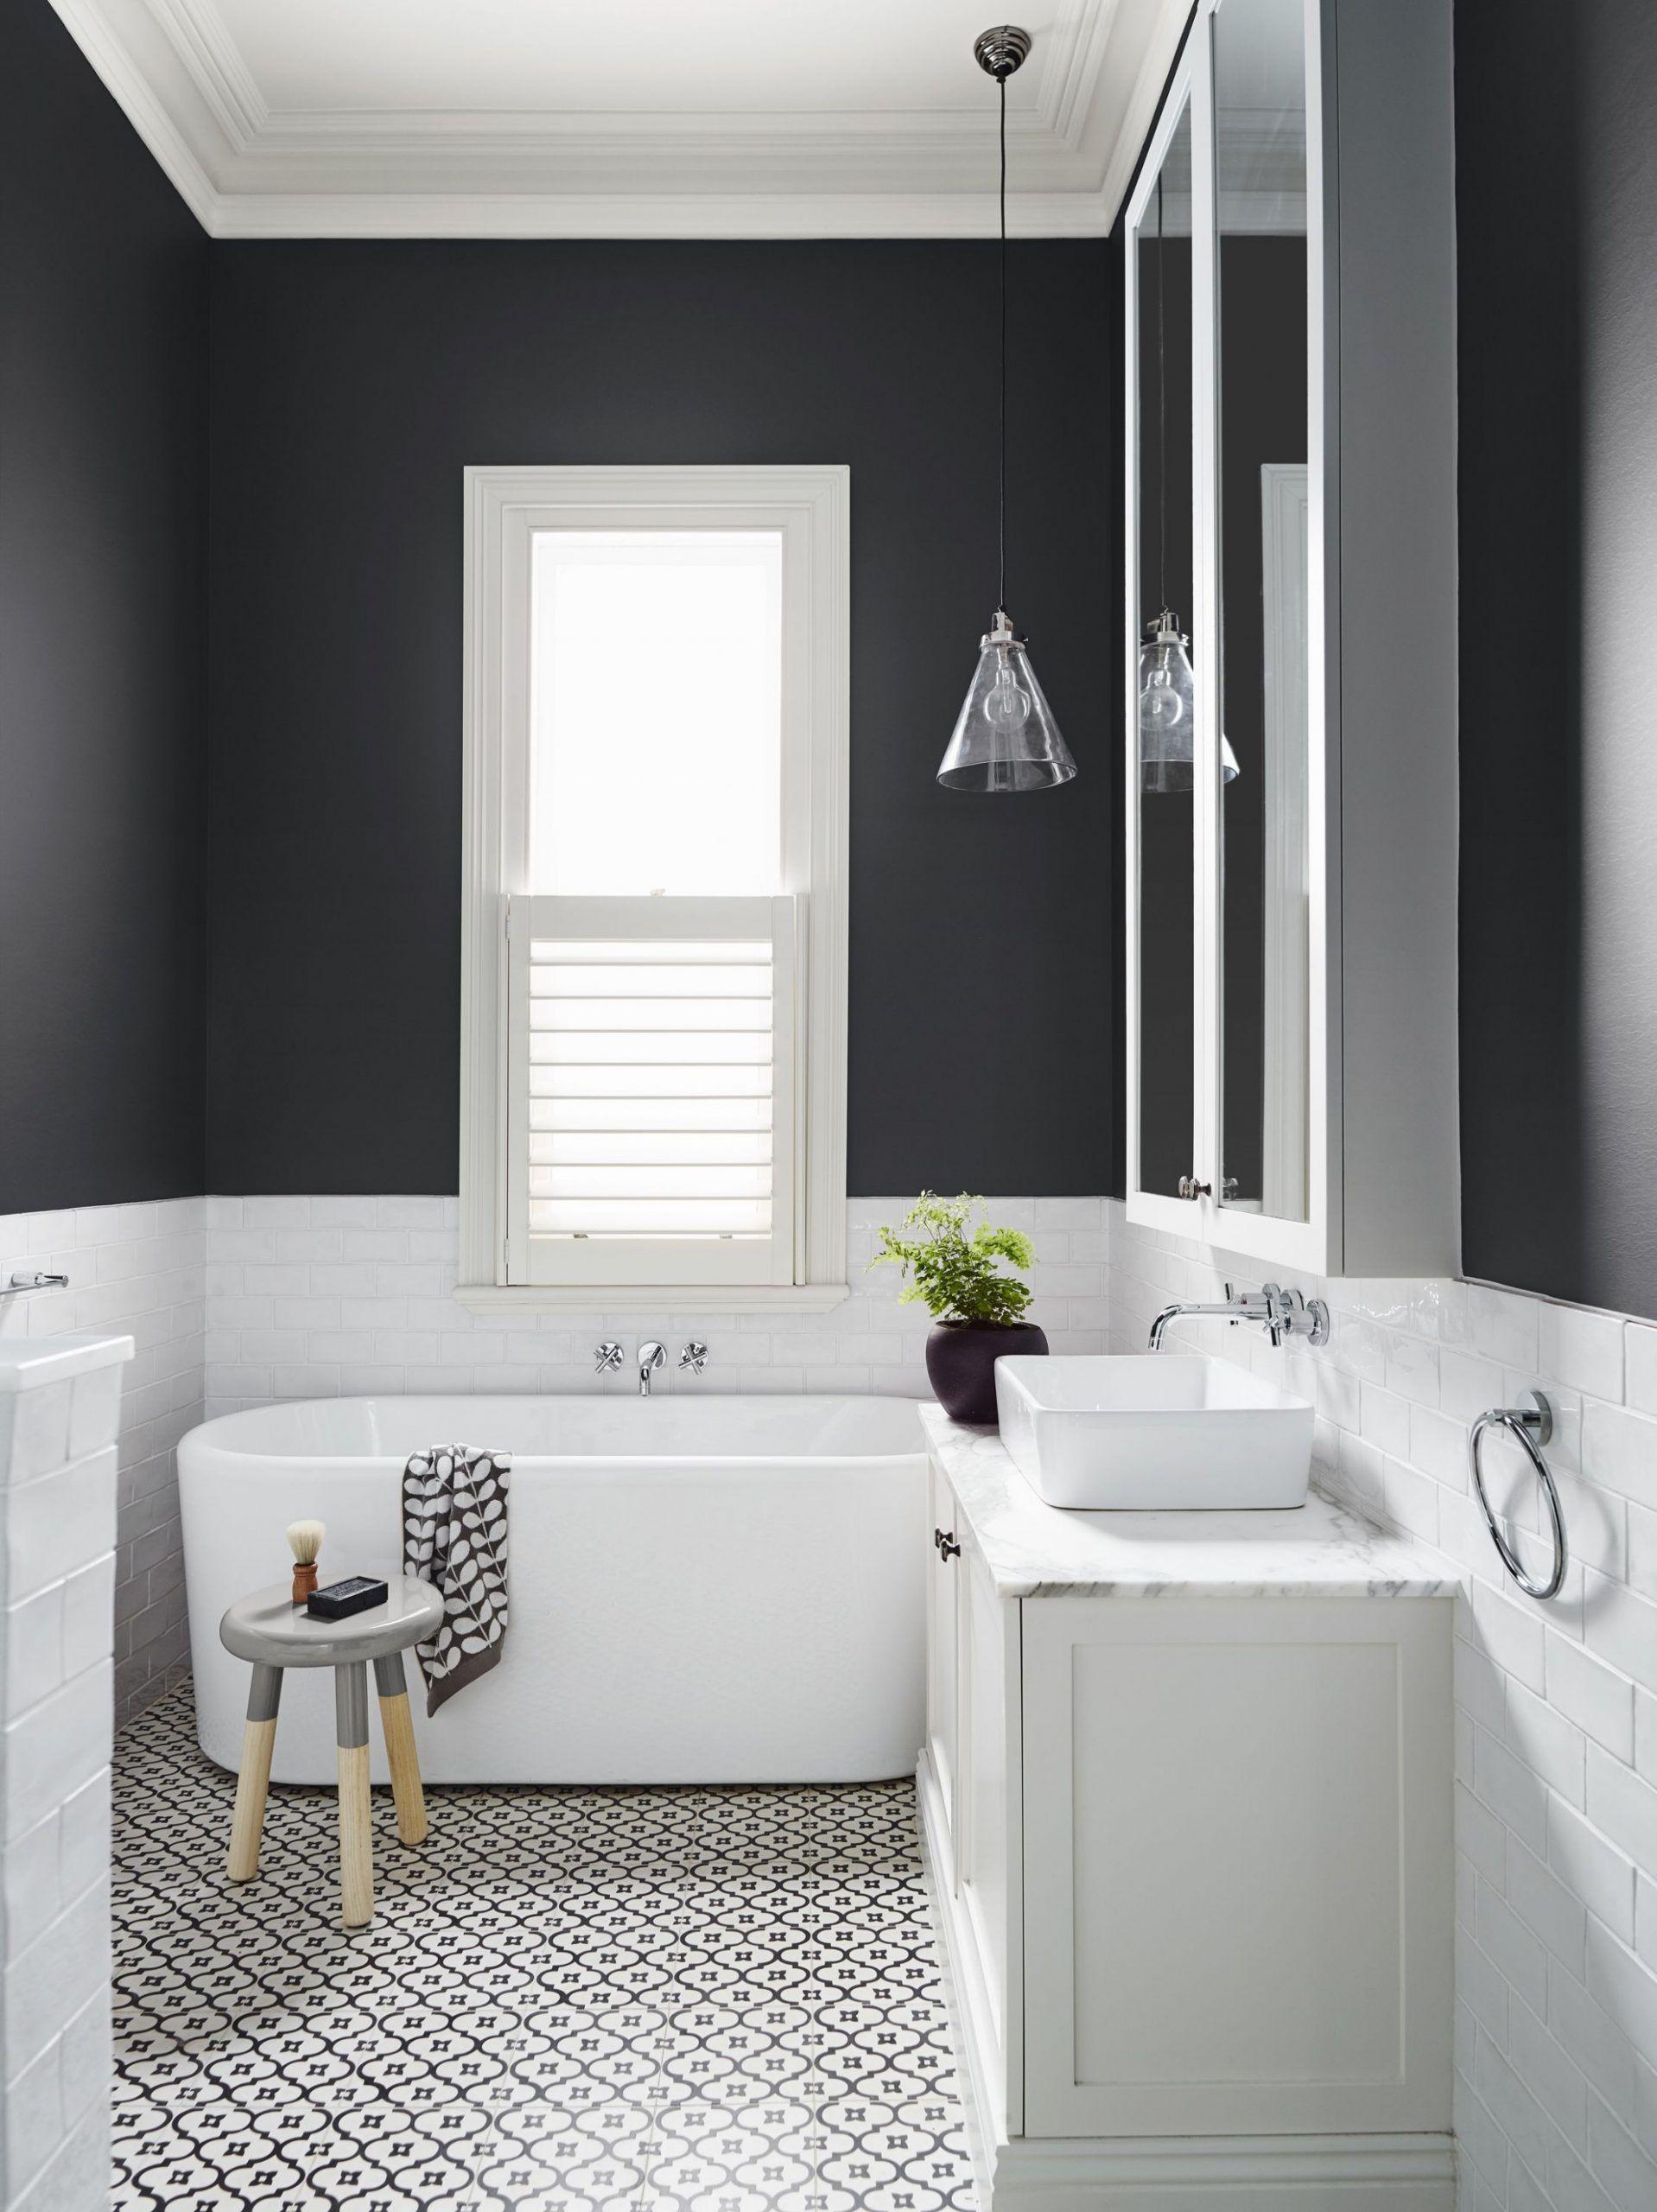 Small Bathroom Ideas Dark Floor